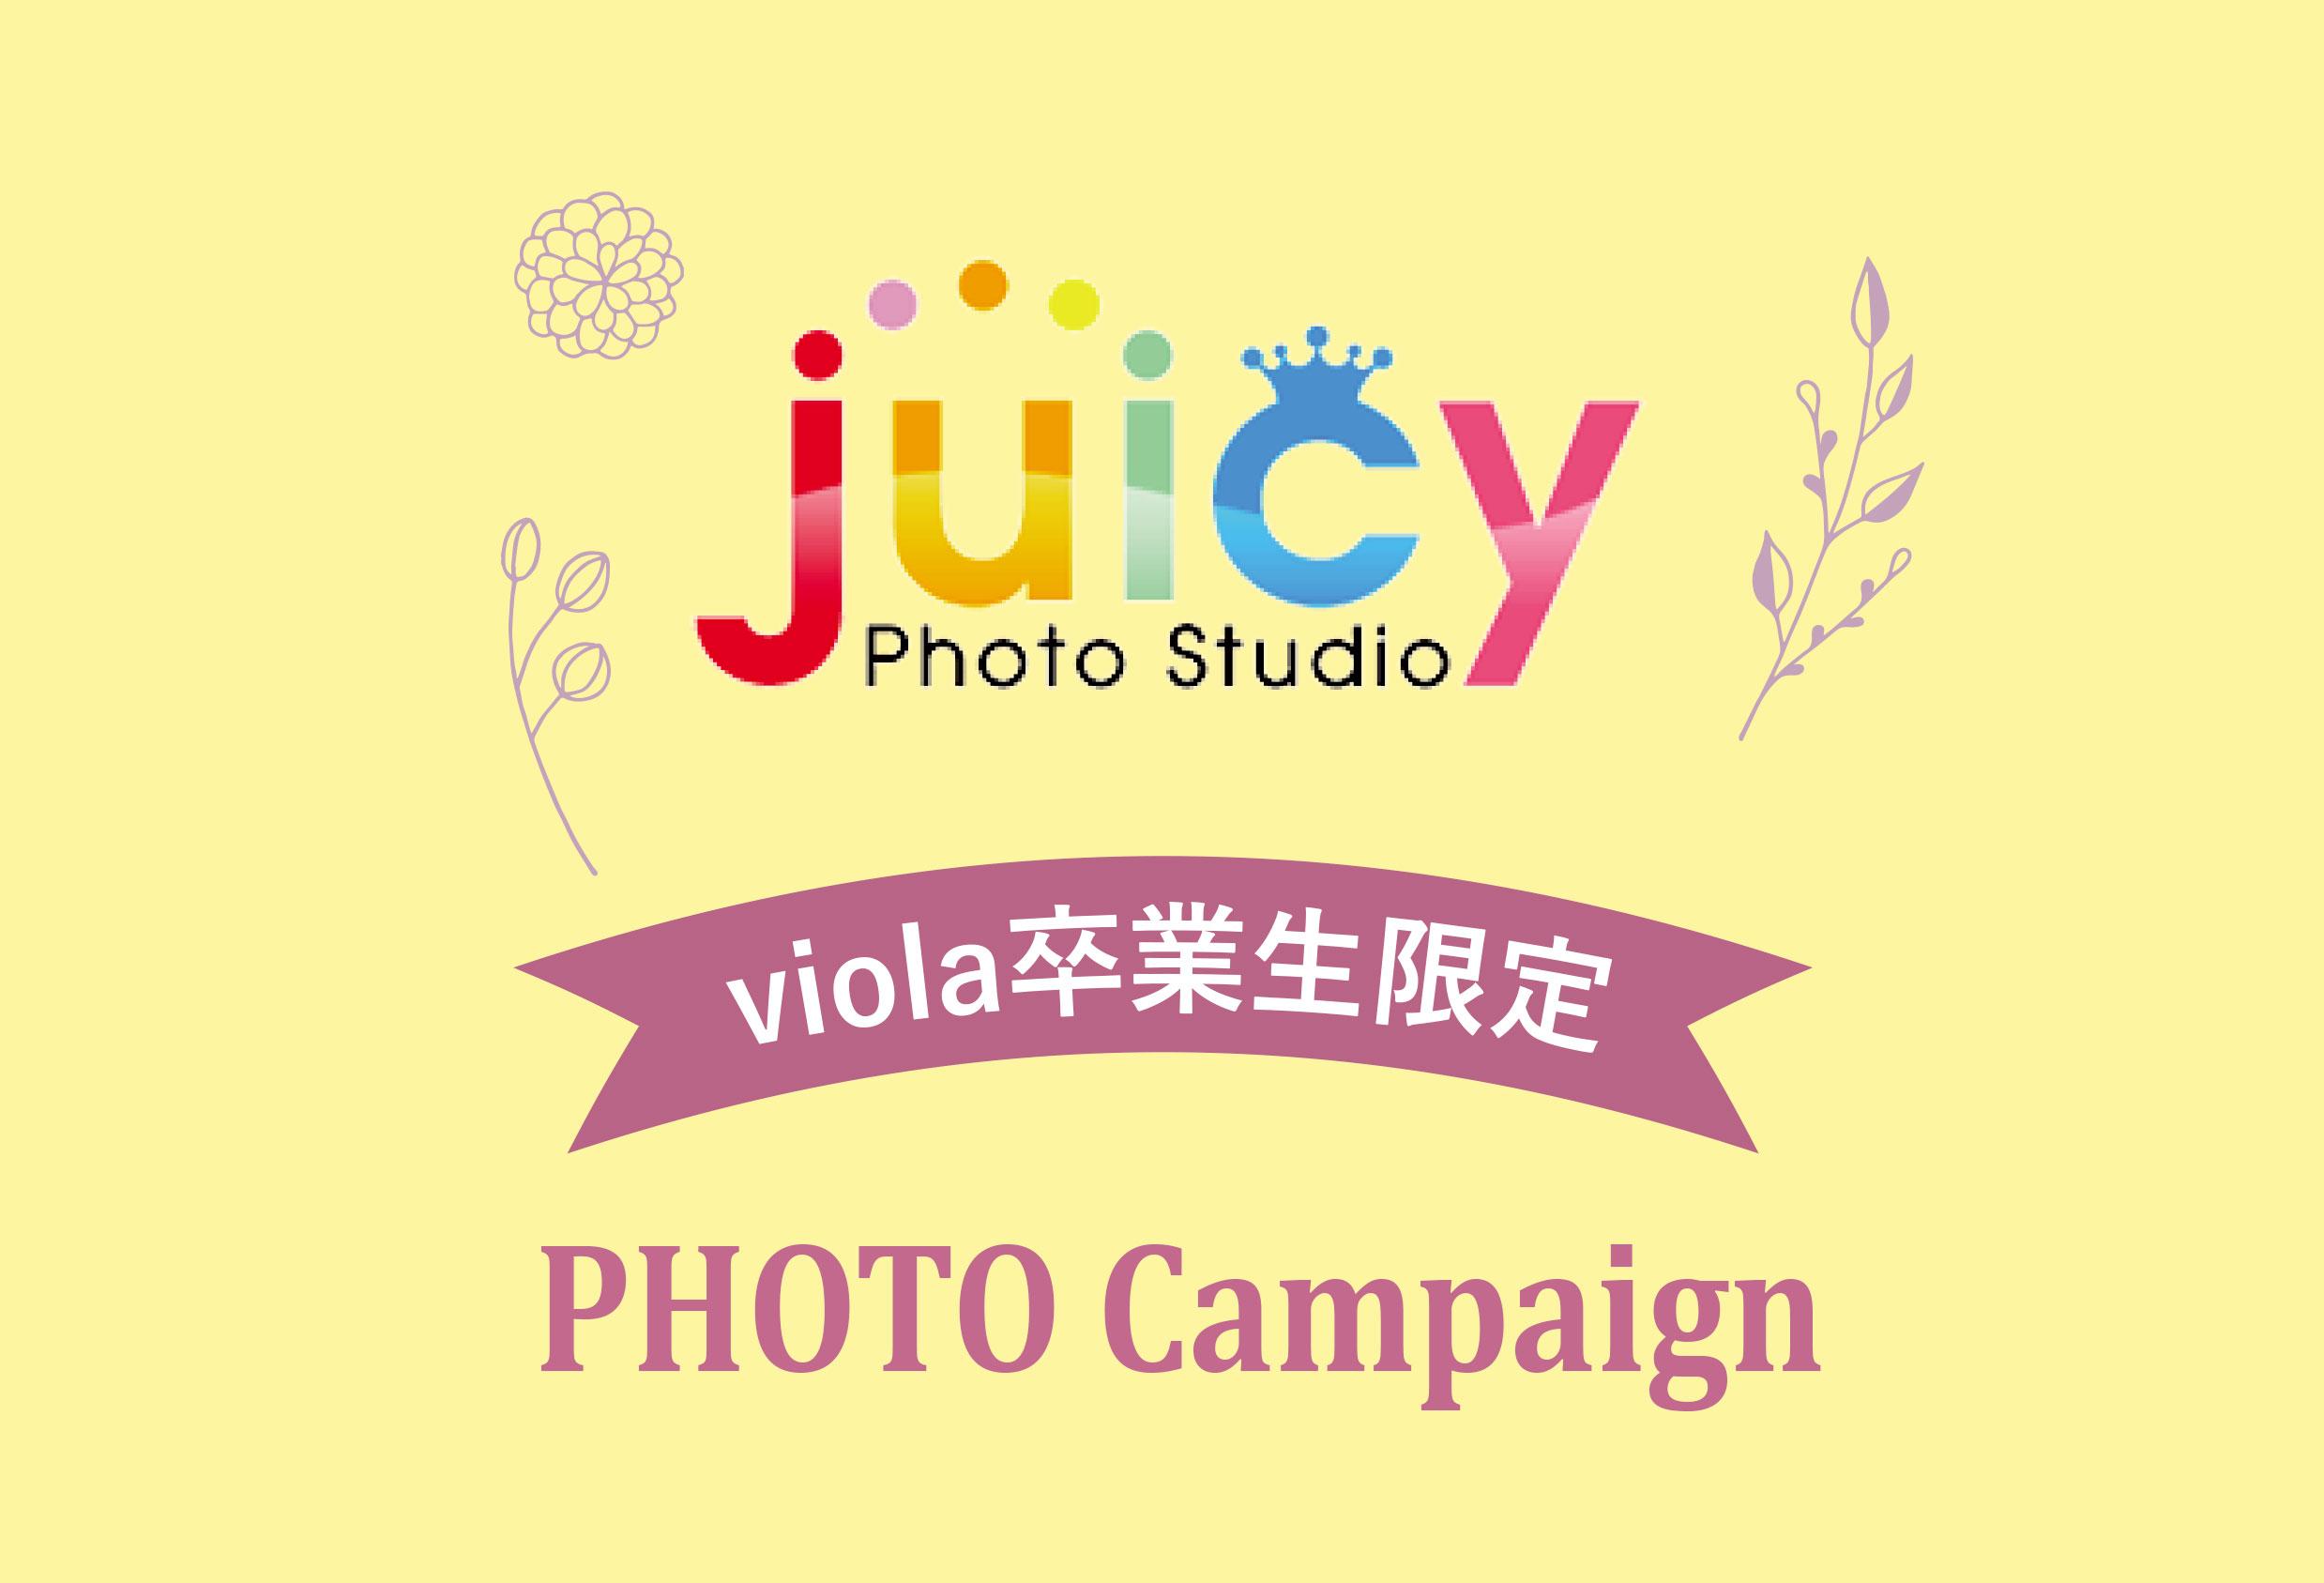 viola卒業生限定!Photo Studio juicy撮影特典!!